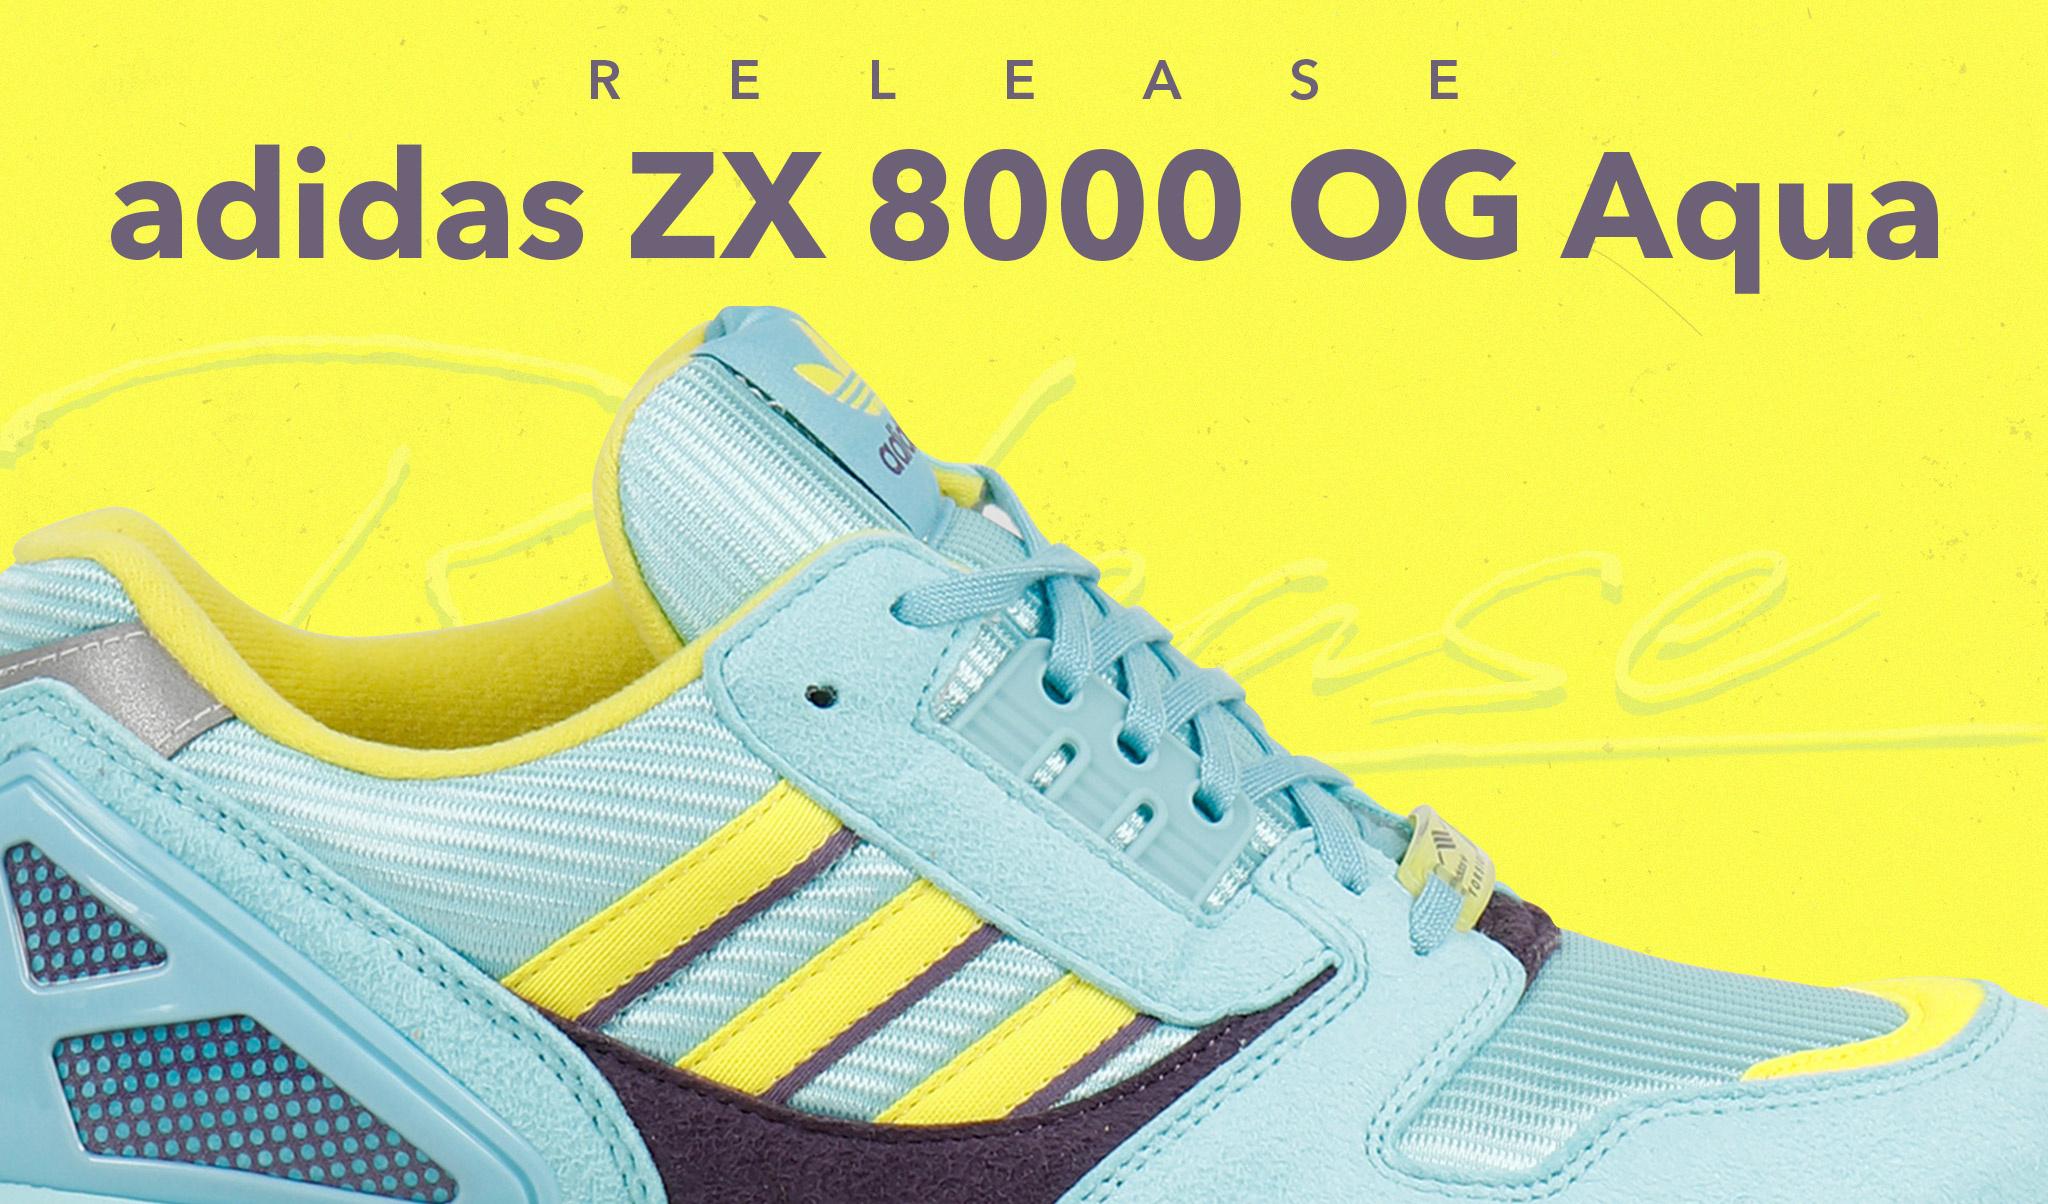 Release - adidas ZX 8000 OG Aqua